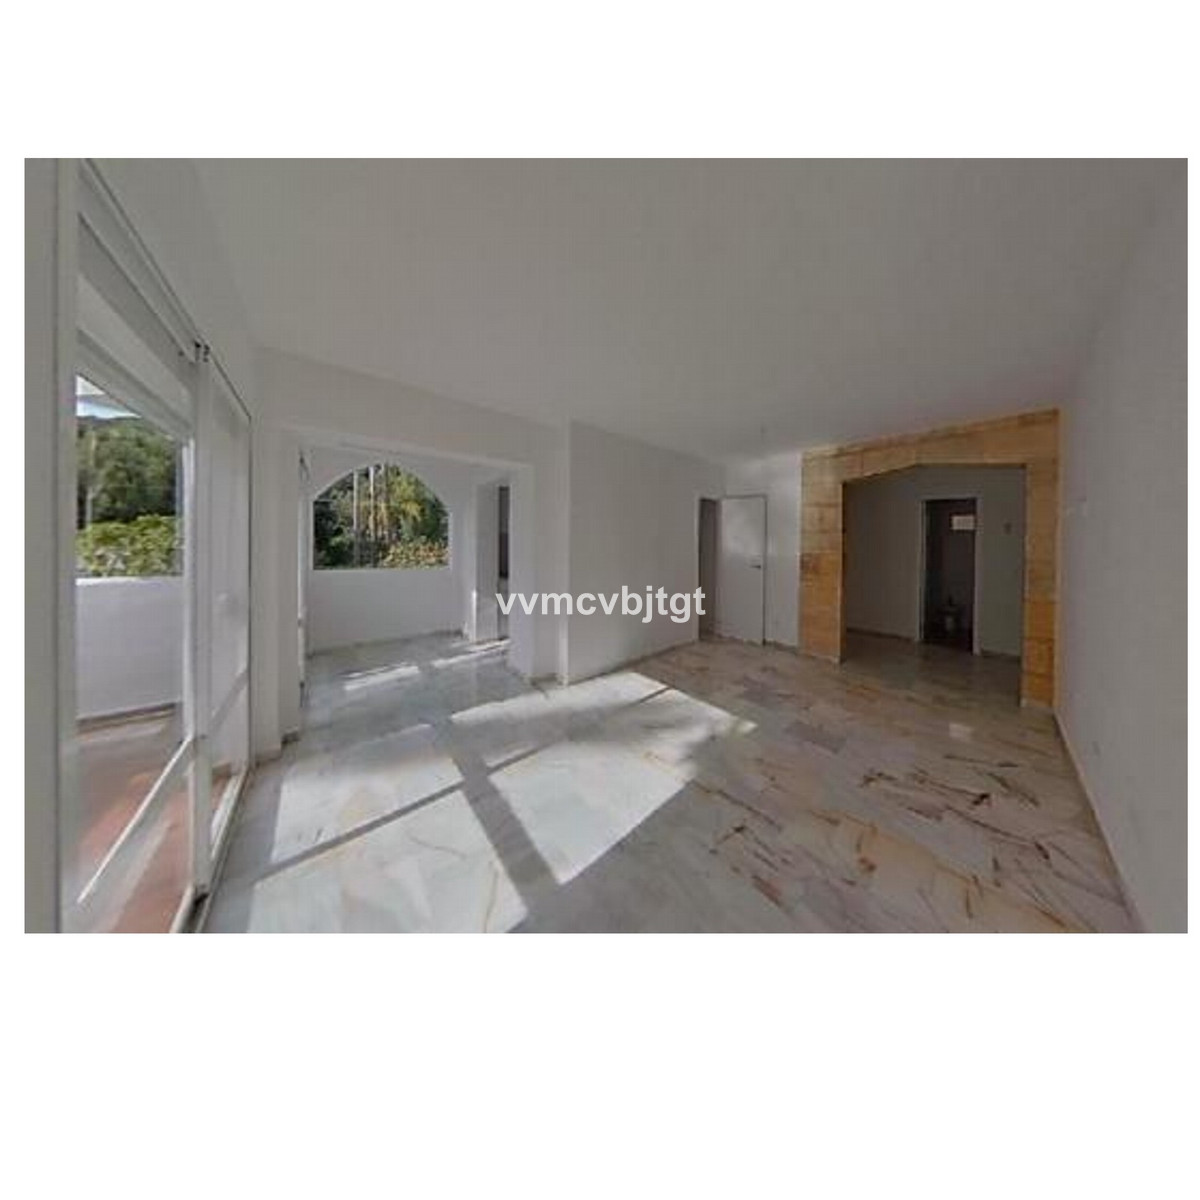 2 bedroom apartment for sale reserva de marbella